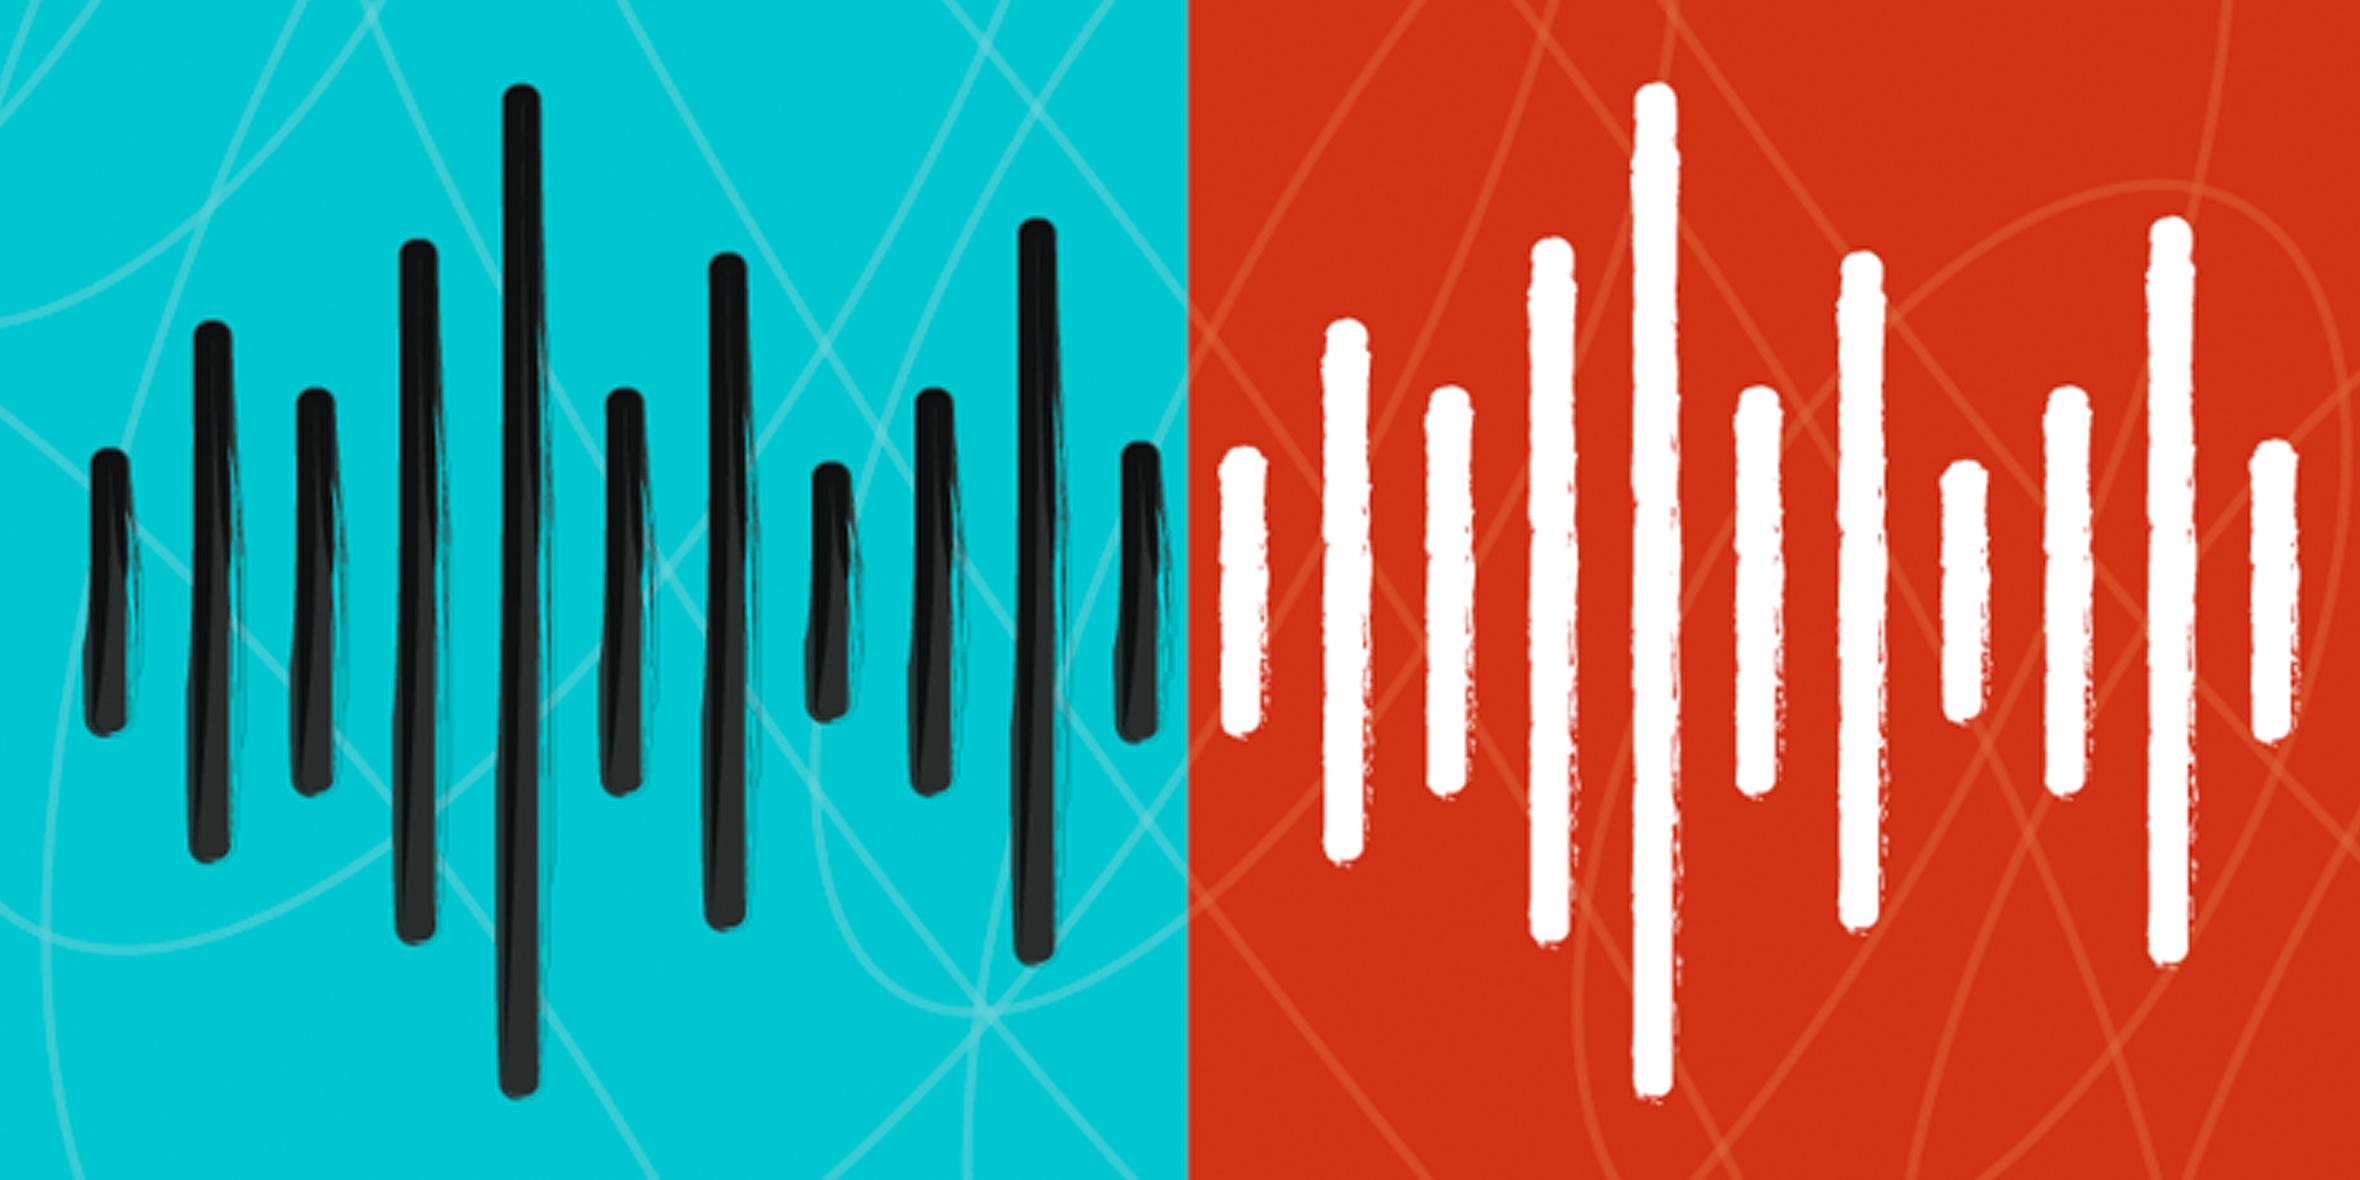 Stylized illustration of sound waves